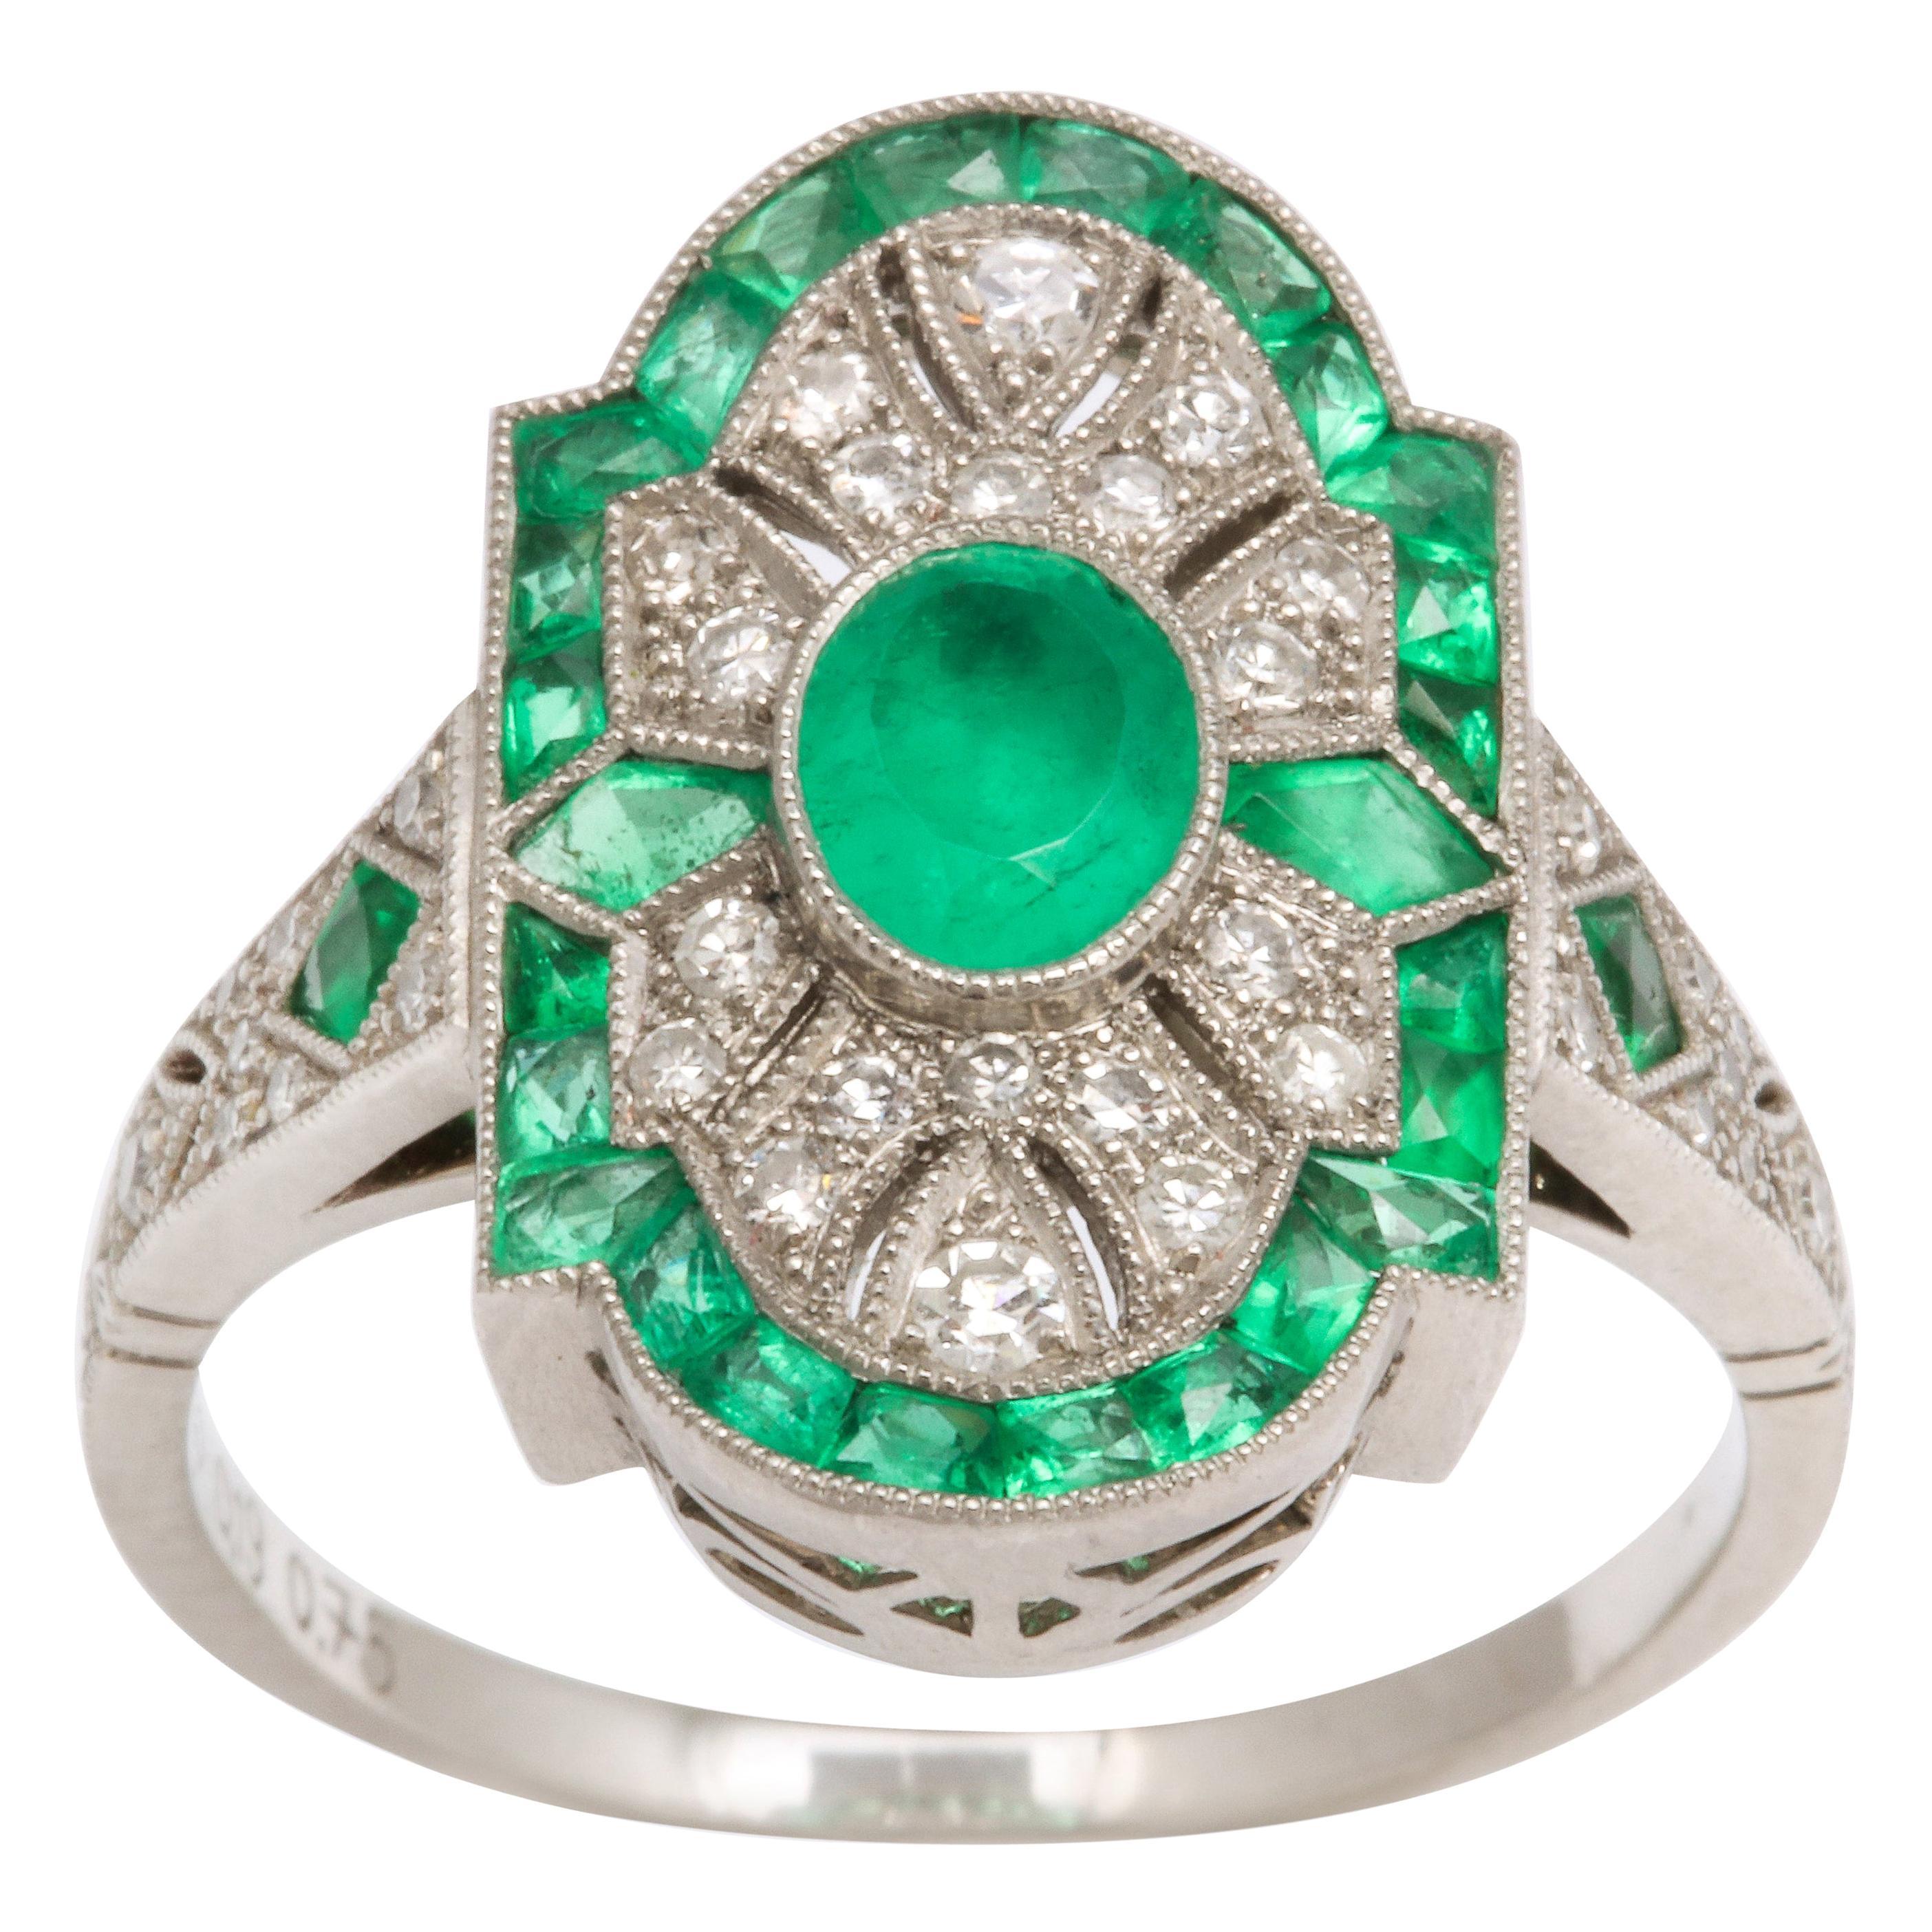 Art Deco Platinum Style Emerald and Diamond Ring